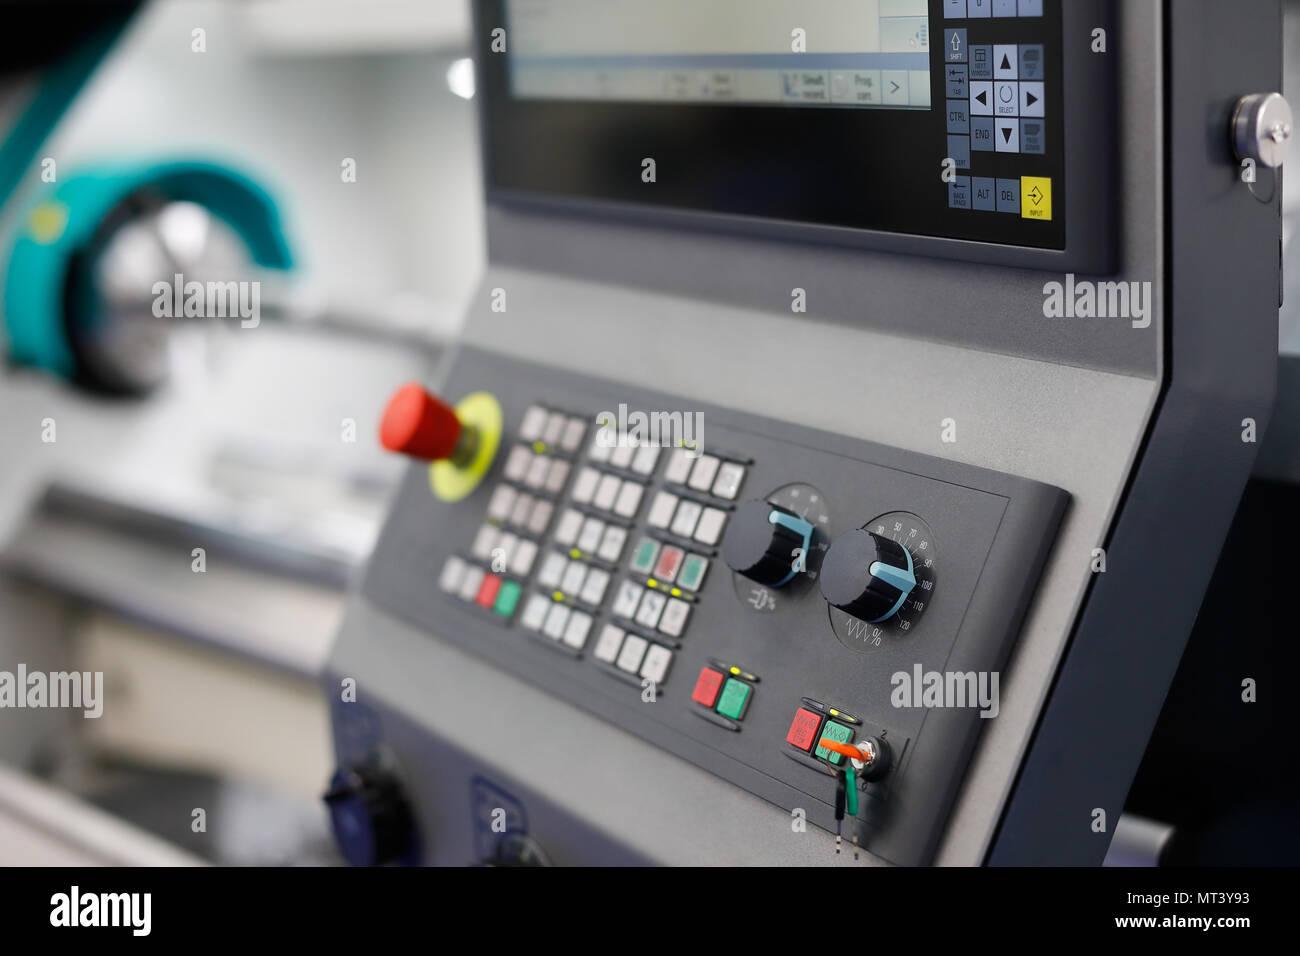 Control panel of the CNC lathe machine. Selective focus. - Stock Image